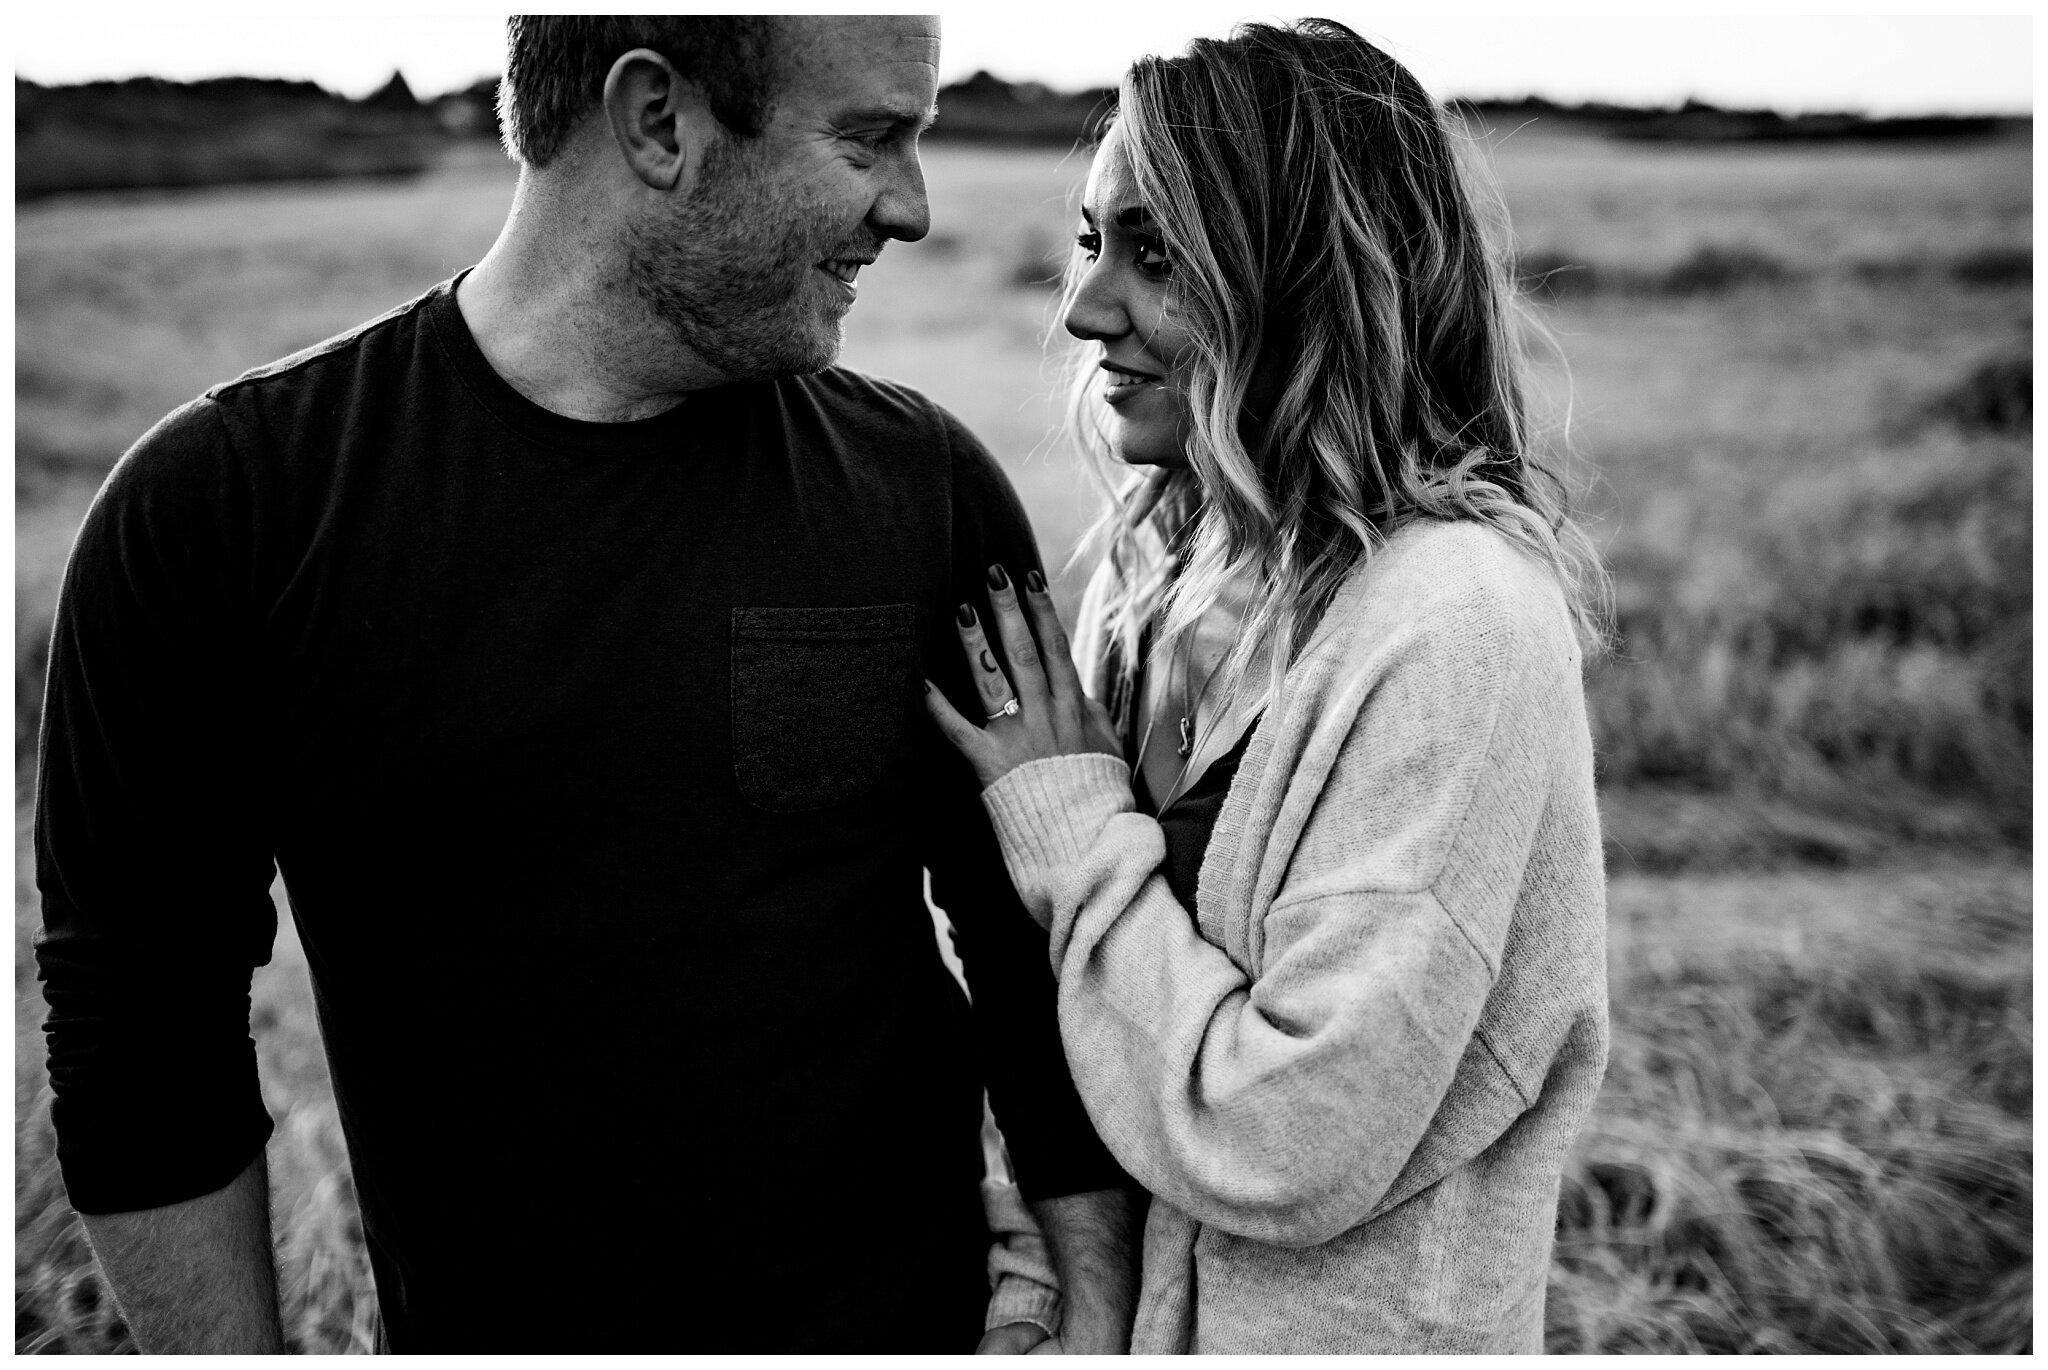 Edmonton Engagement Photographer Romantic Couples Photos Local YEG Strathcona County_0008.jpg